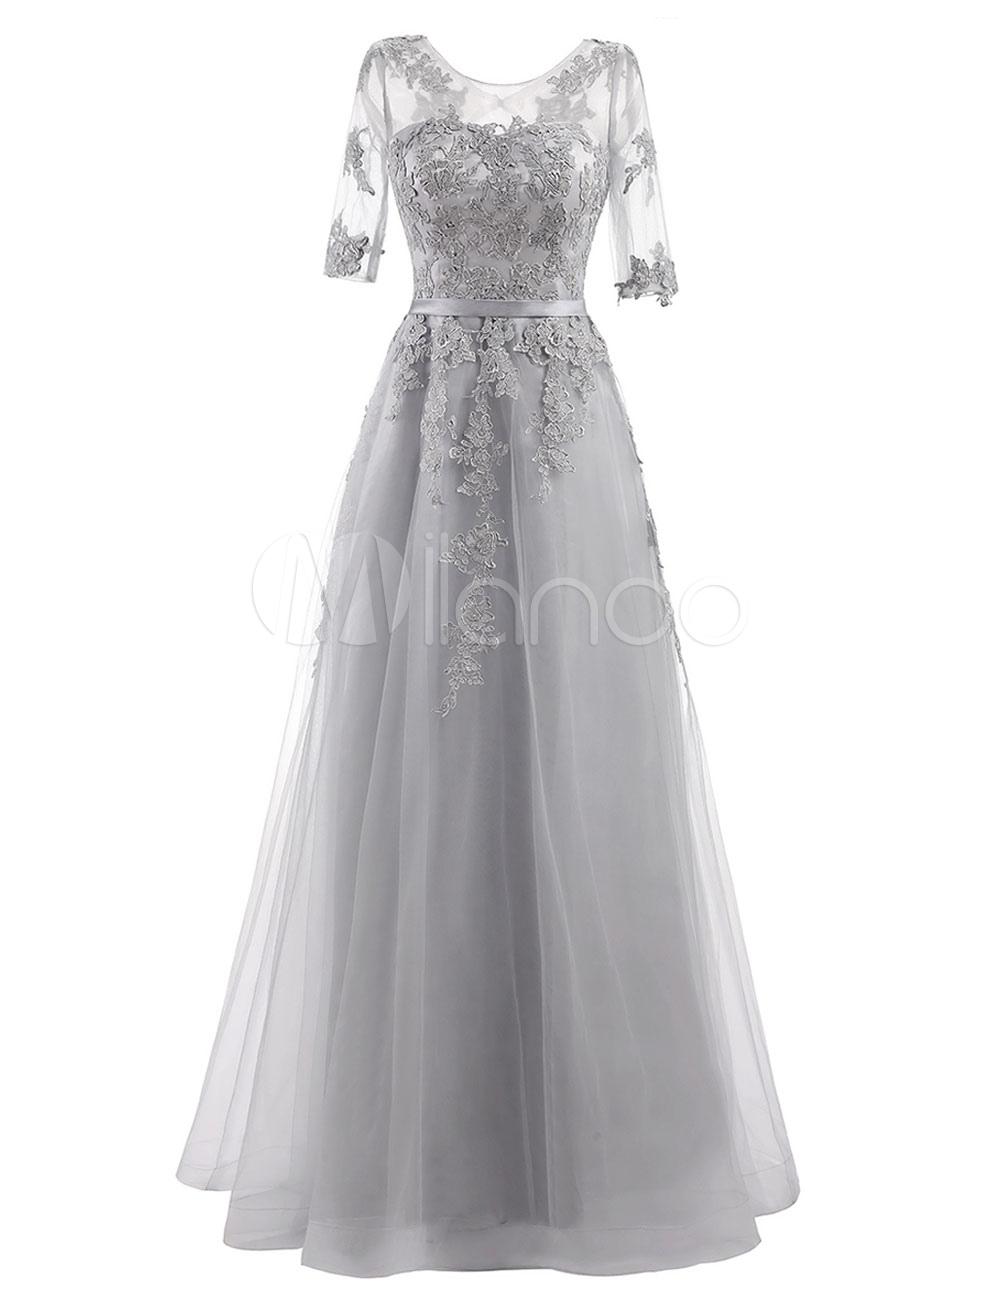 bb9e022f097 ... Evening Dress Lace Applique Tulle Half Sleeve Floor Length. 1. 50%OFF.  Color Light Grey